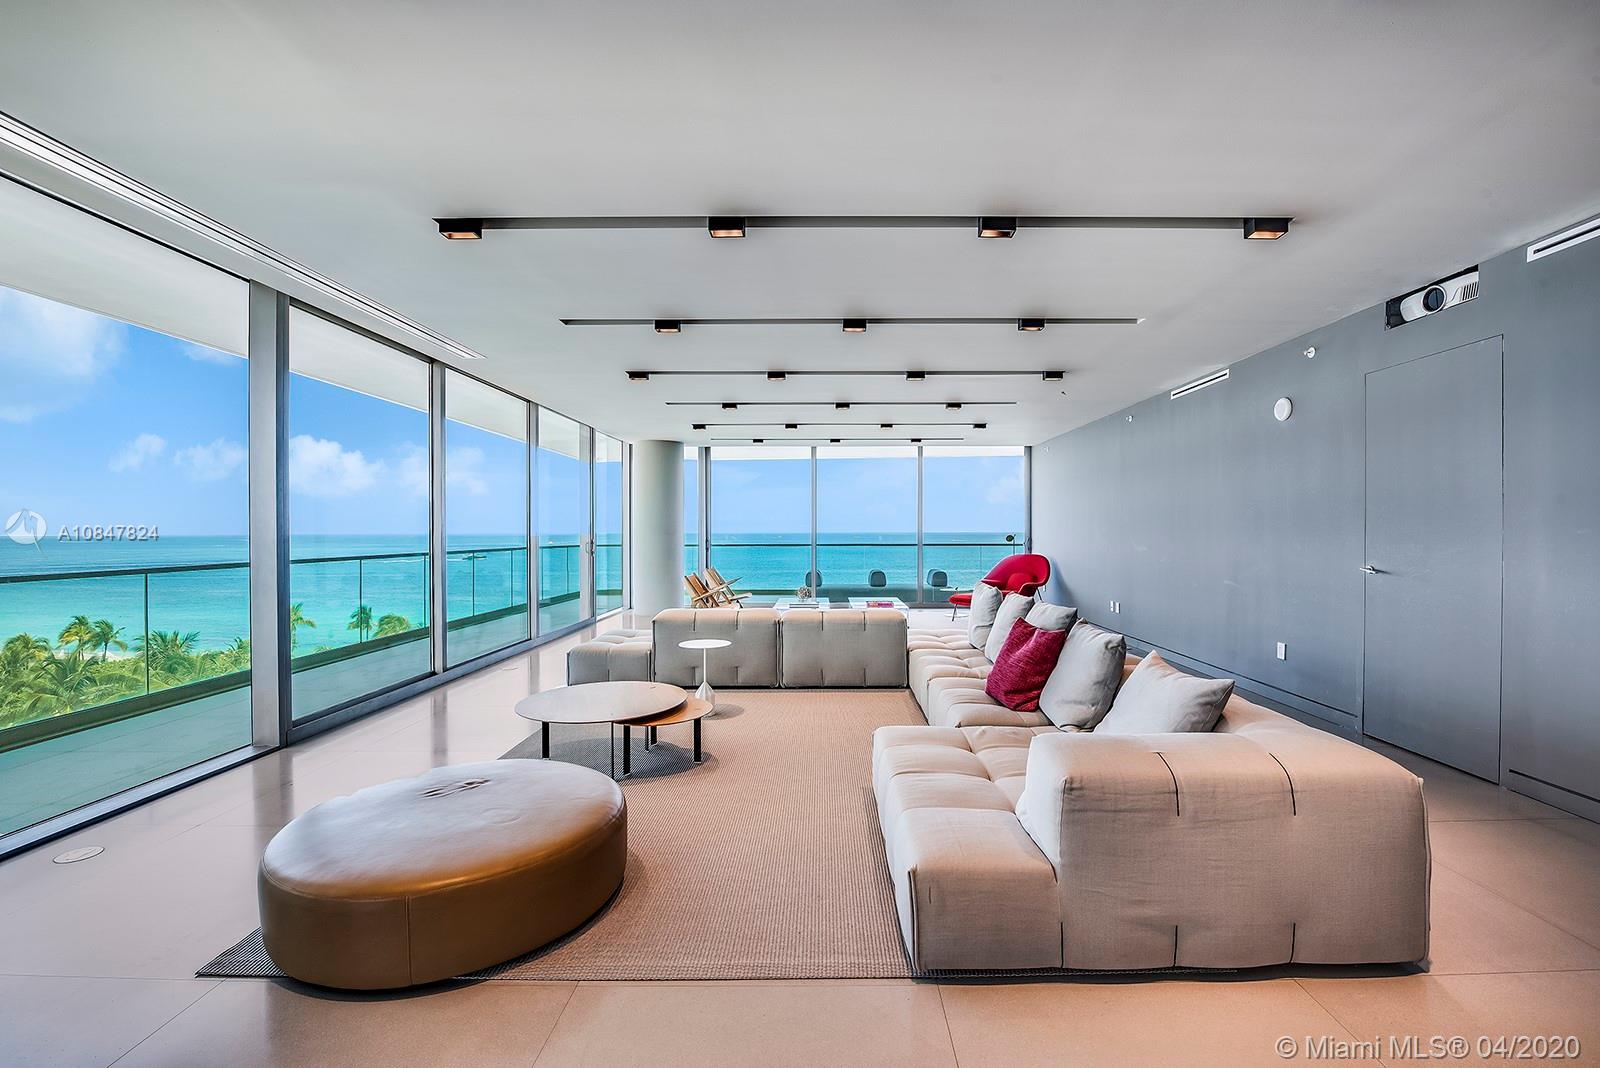 image #1 of property, Oceana Bal Harbour Condo, Unit 701